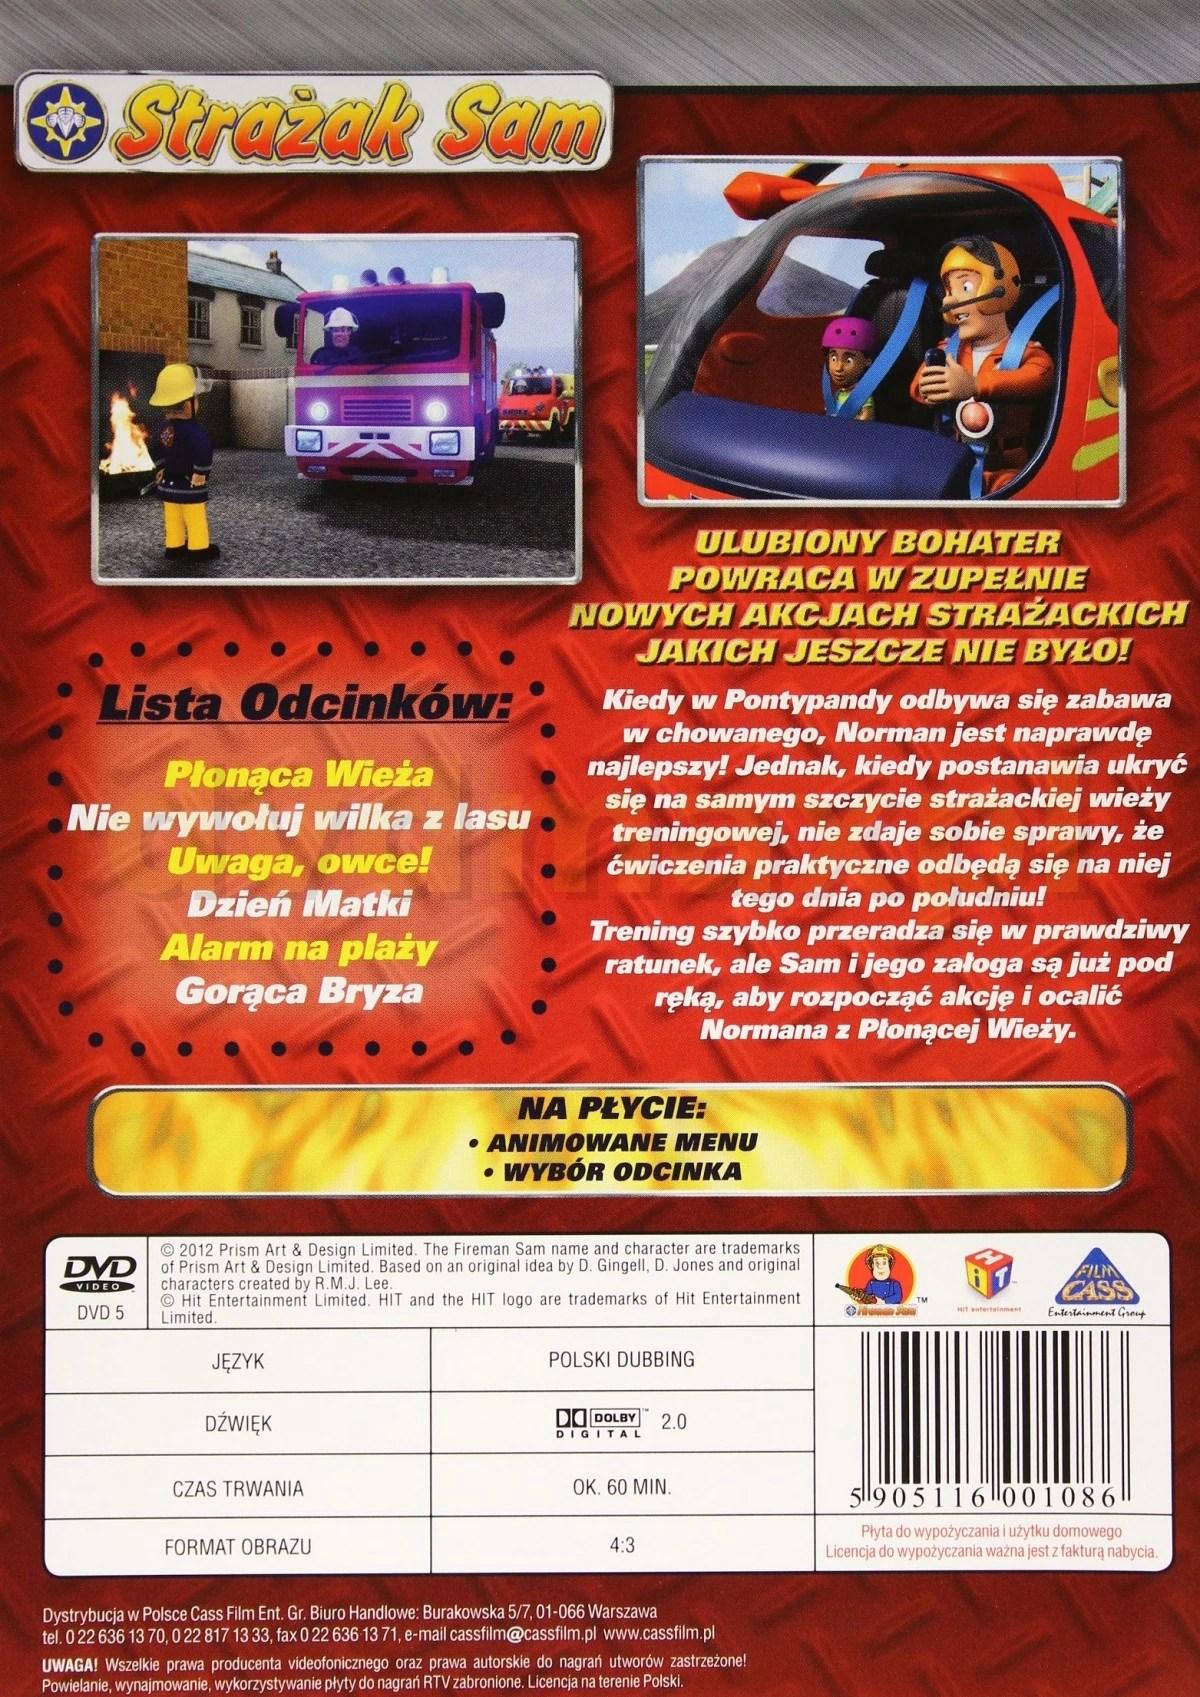 Towering Inferno DVD Fireman Sam Wiki FANDOM Powered By Wikia